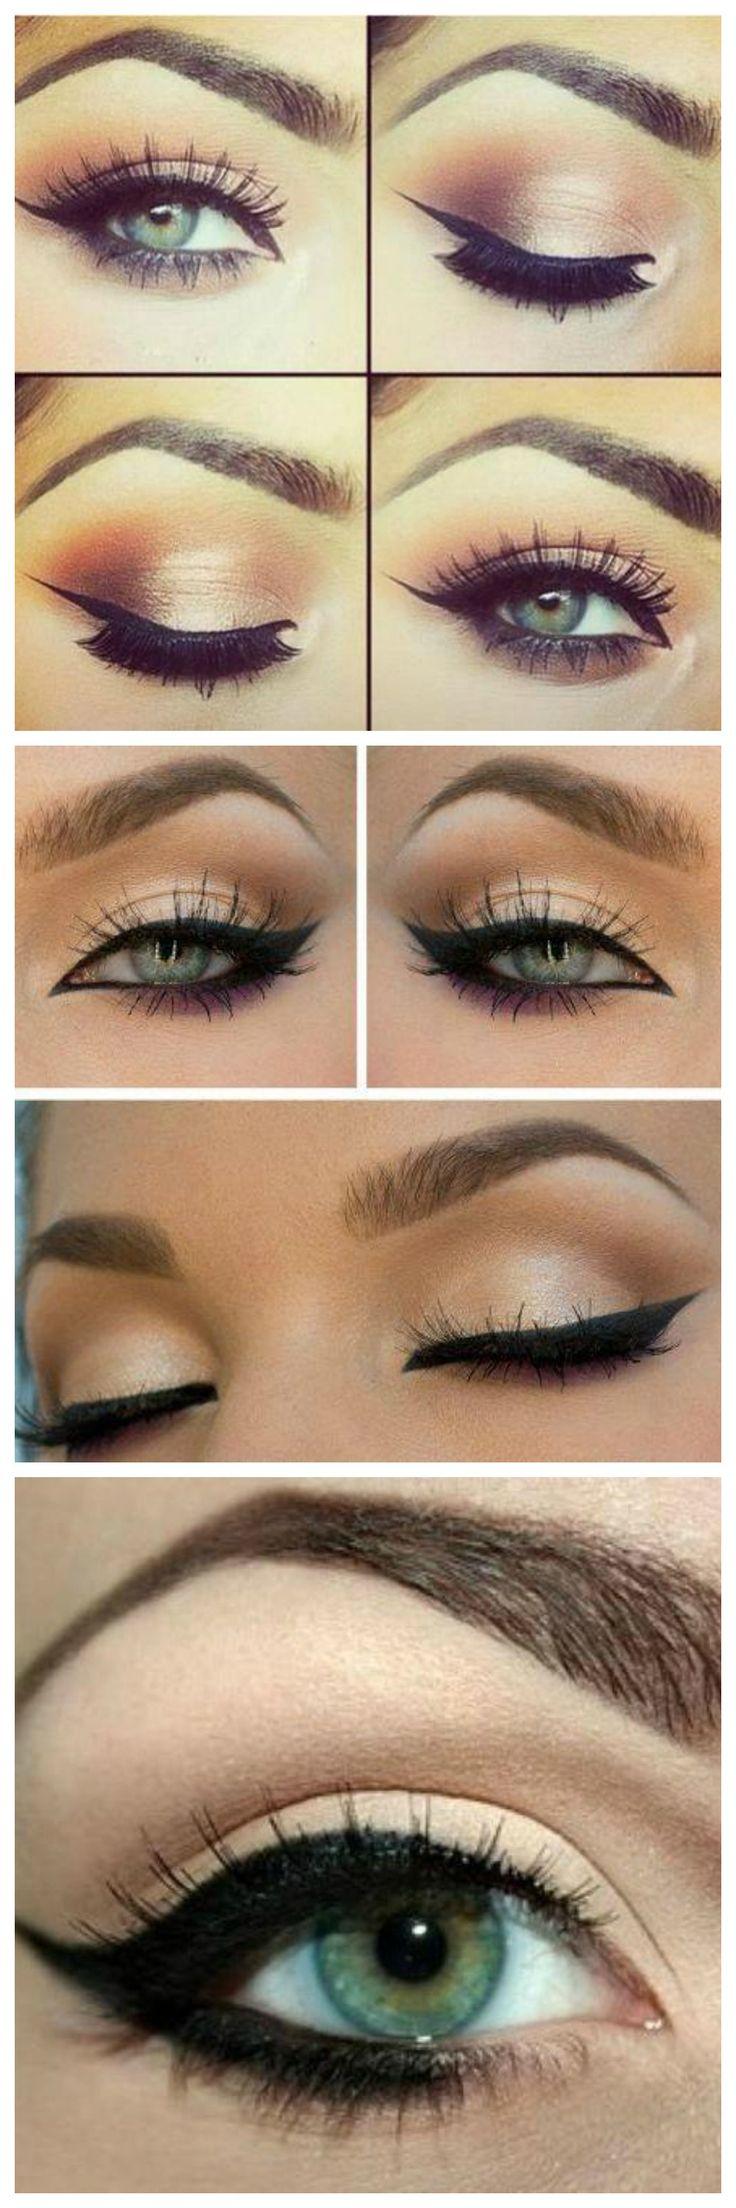 best wedding make up images on pinterest beauty makeup